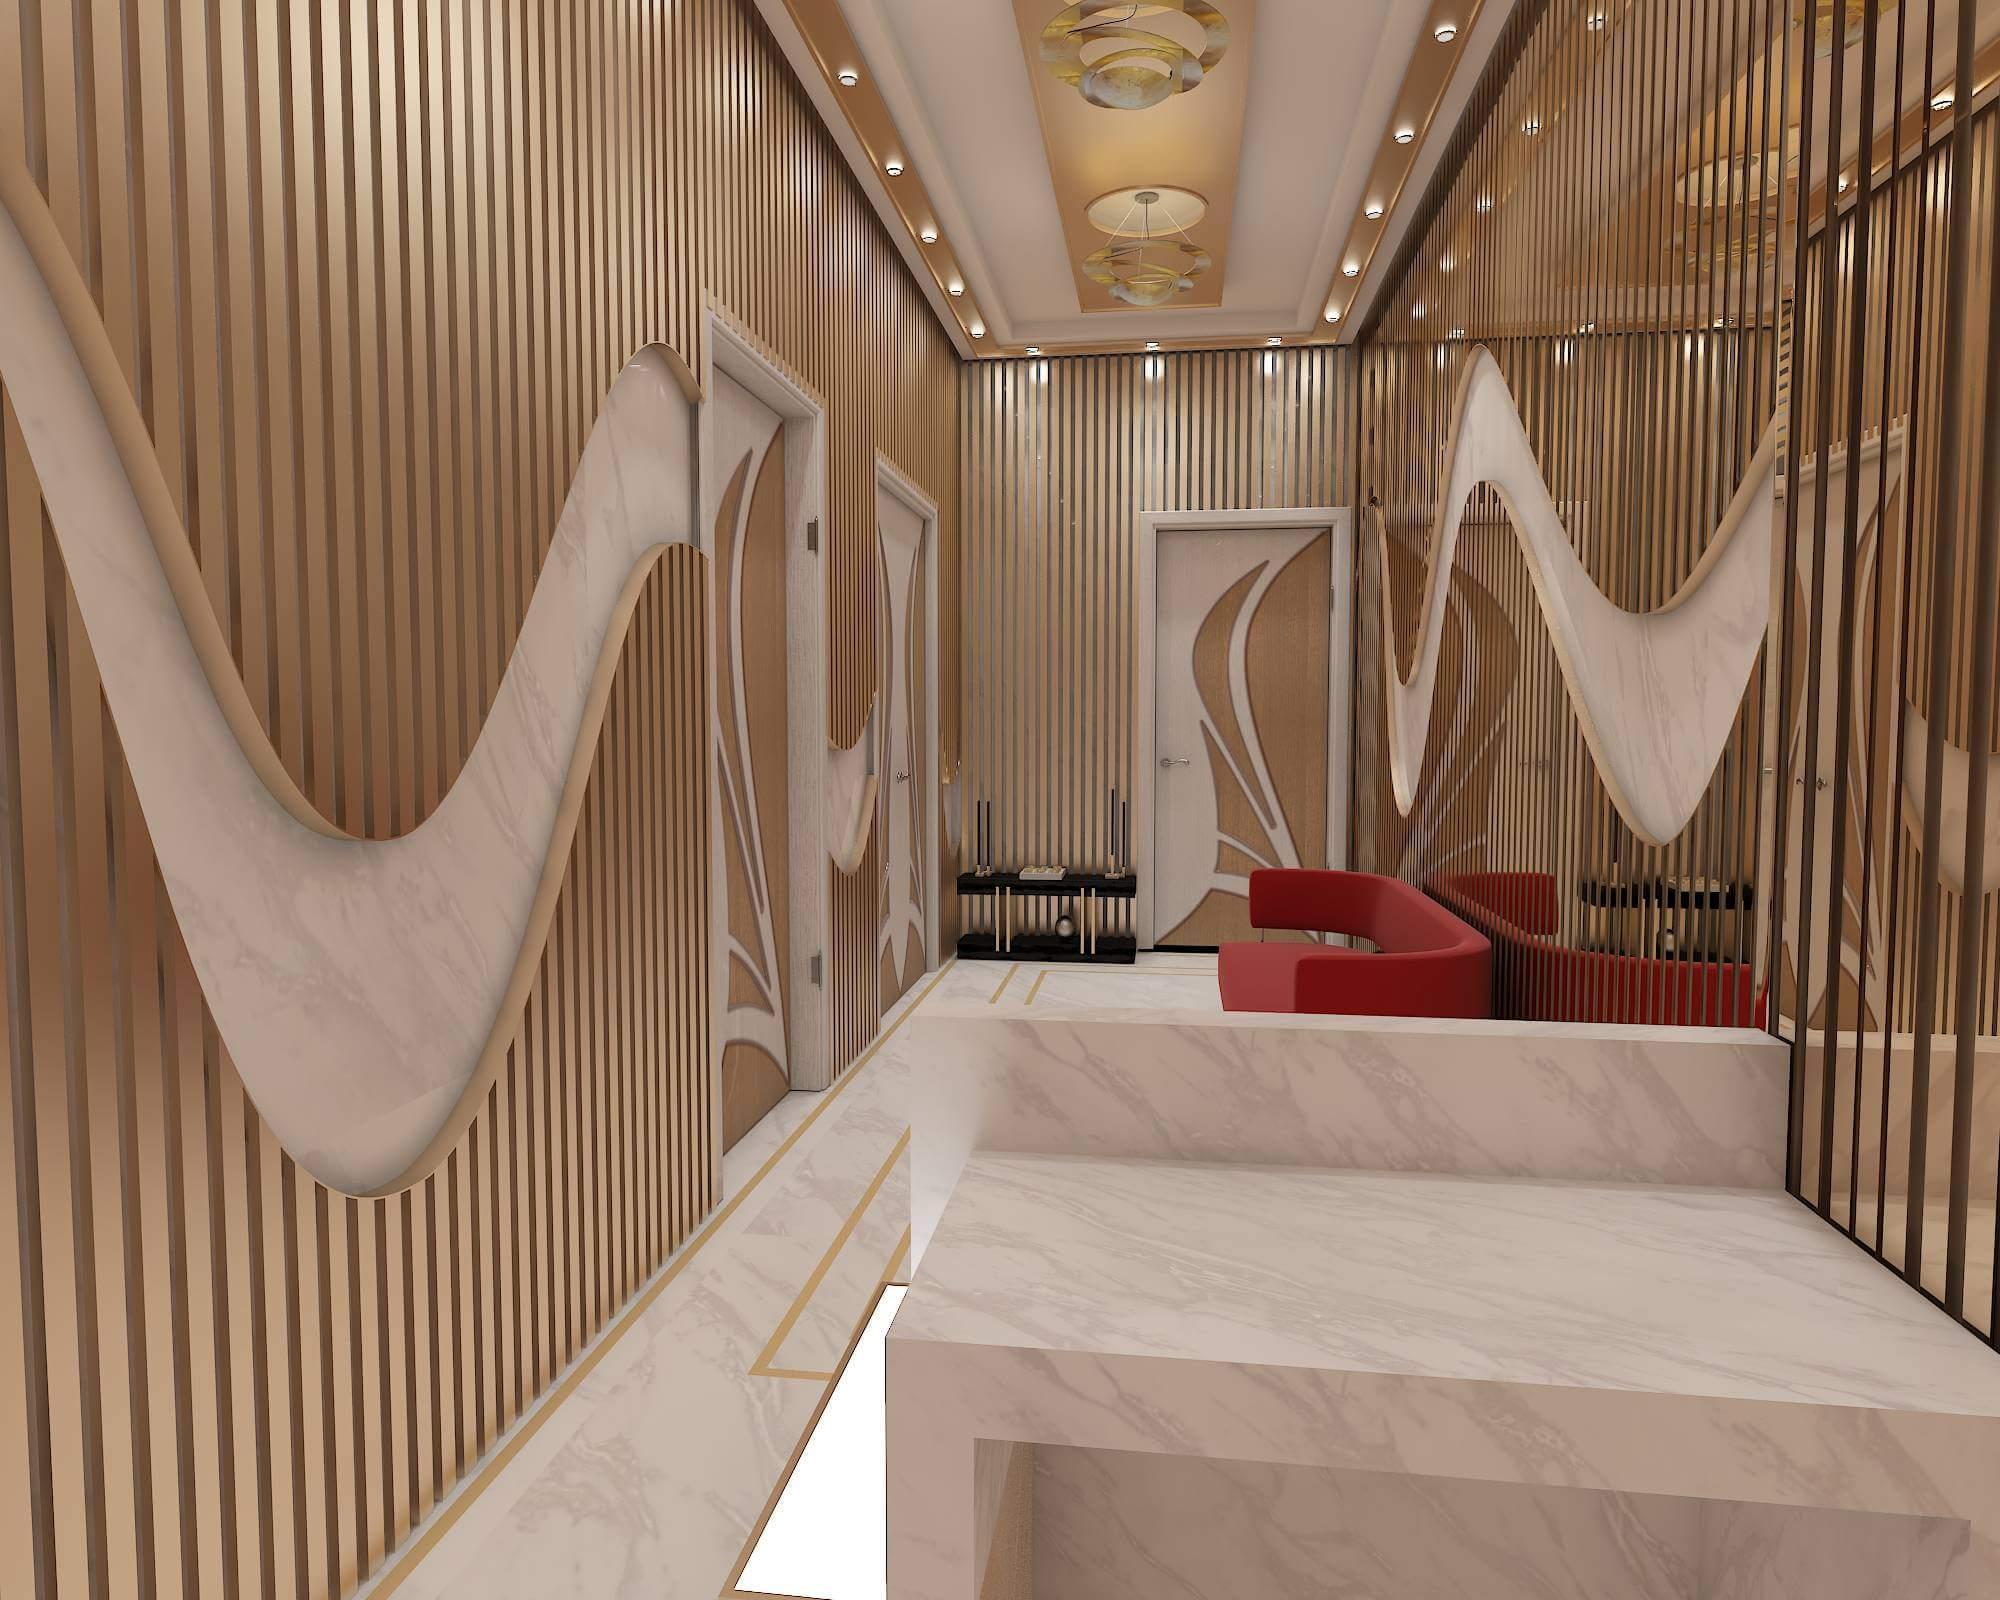 Reception beauty parlor design